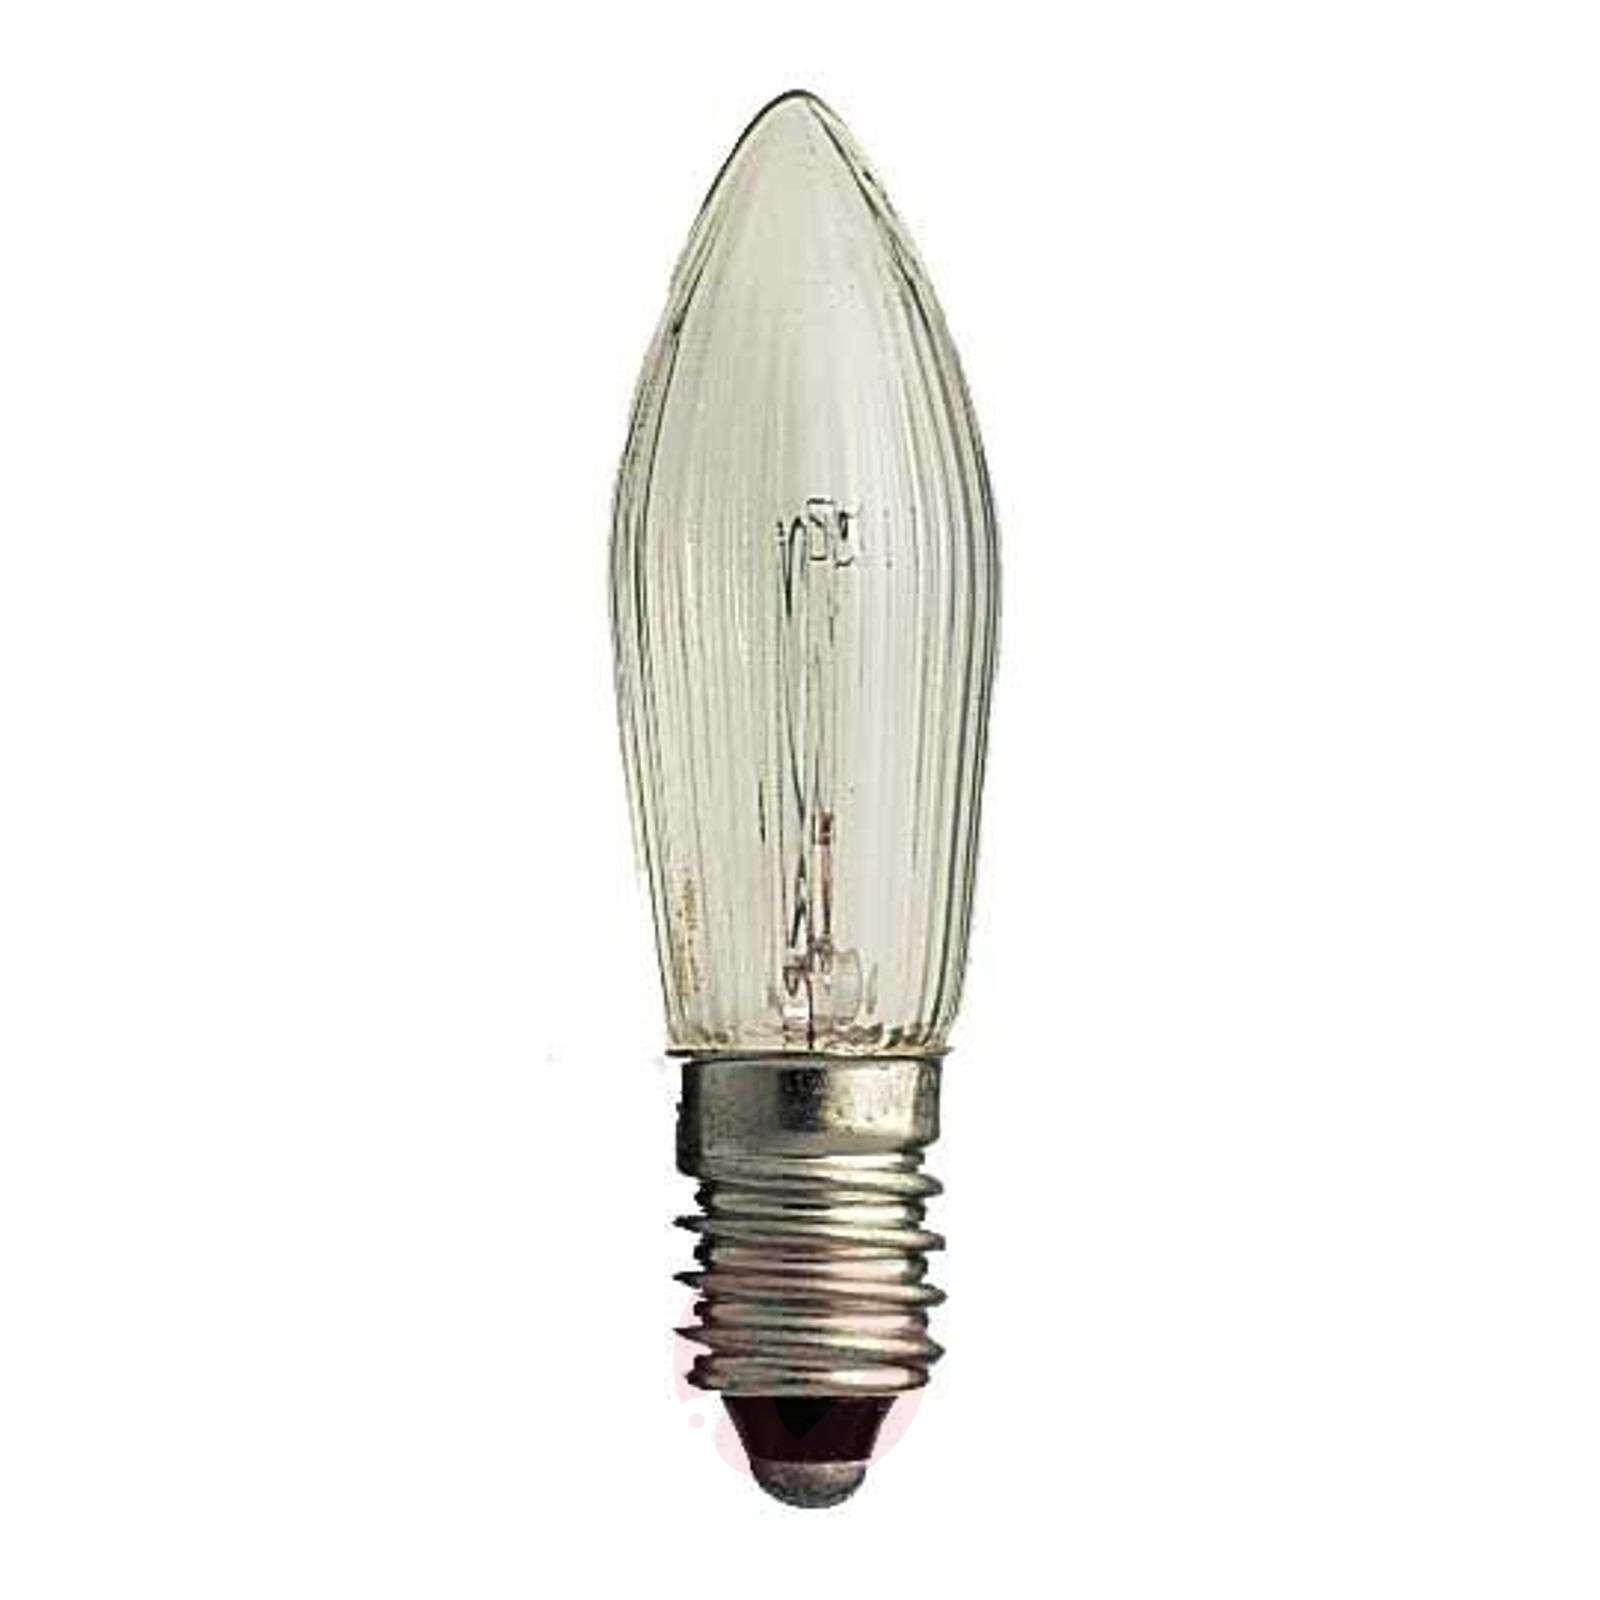 E10 3W 55V bulb, pack of 3, candle shape_1522321_1